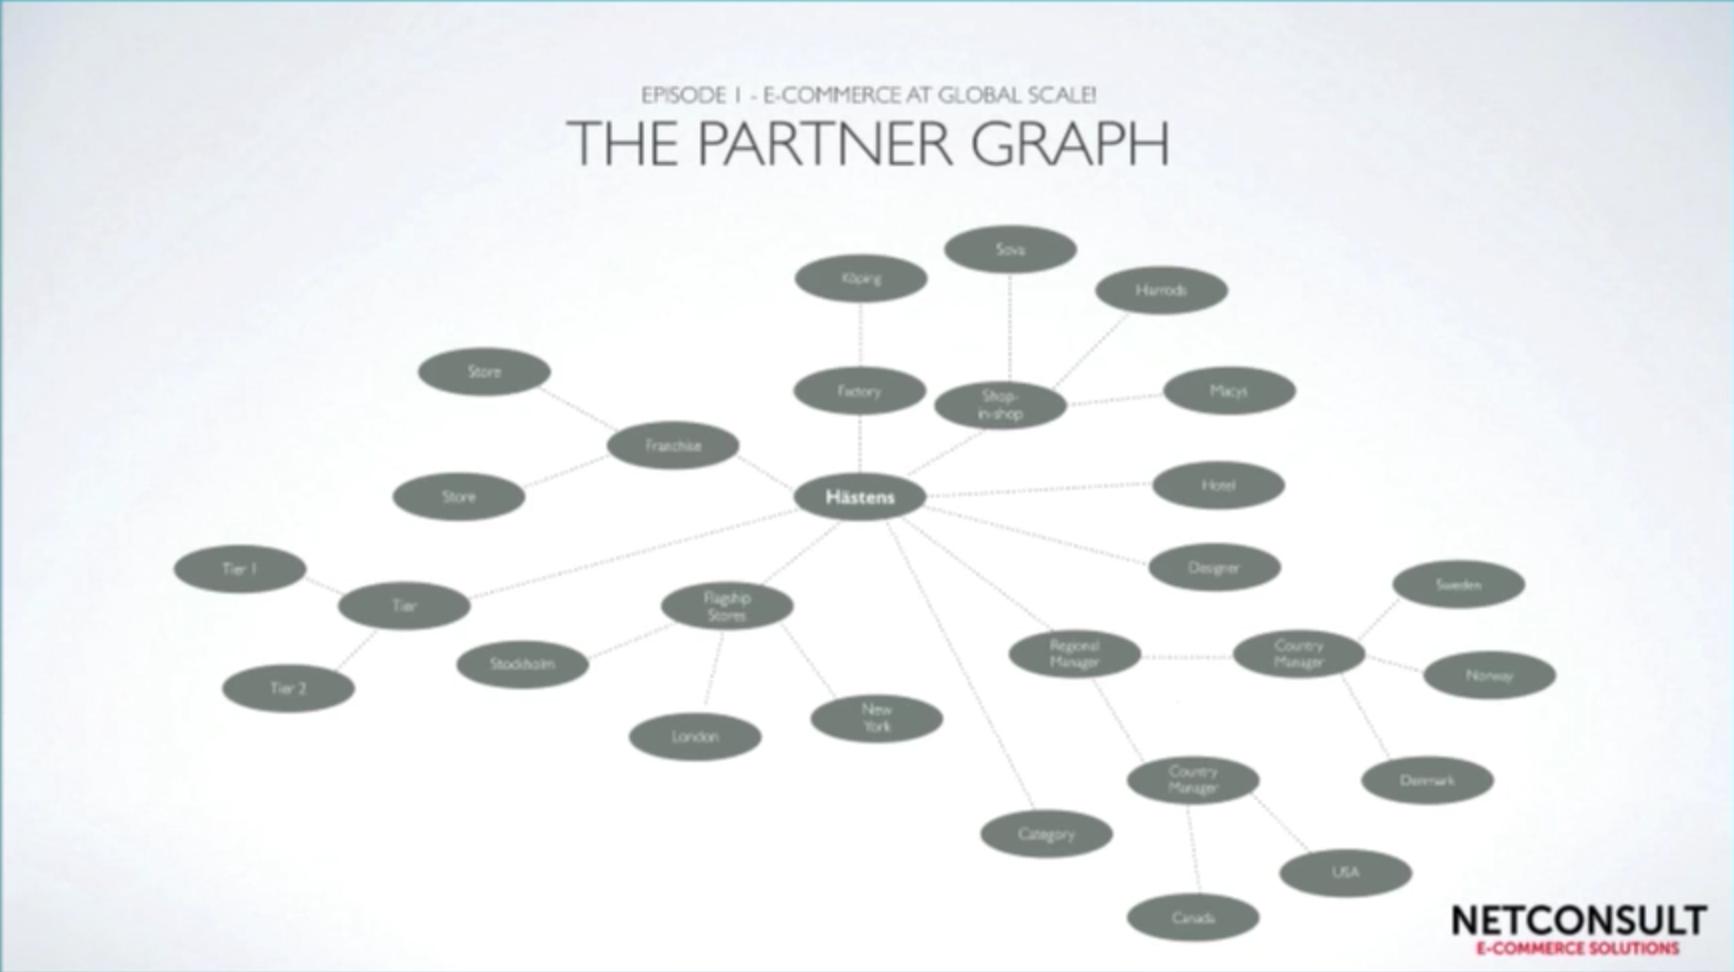 Watch Anders Ekström and Kent Lovestjärnaan's presentation optimizing business performance through digitalization